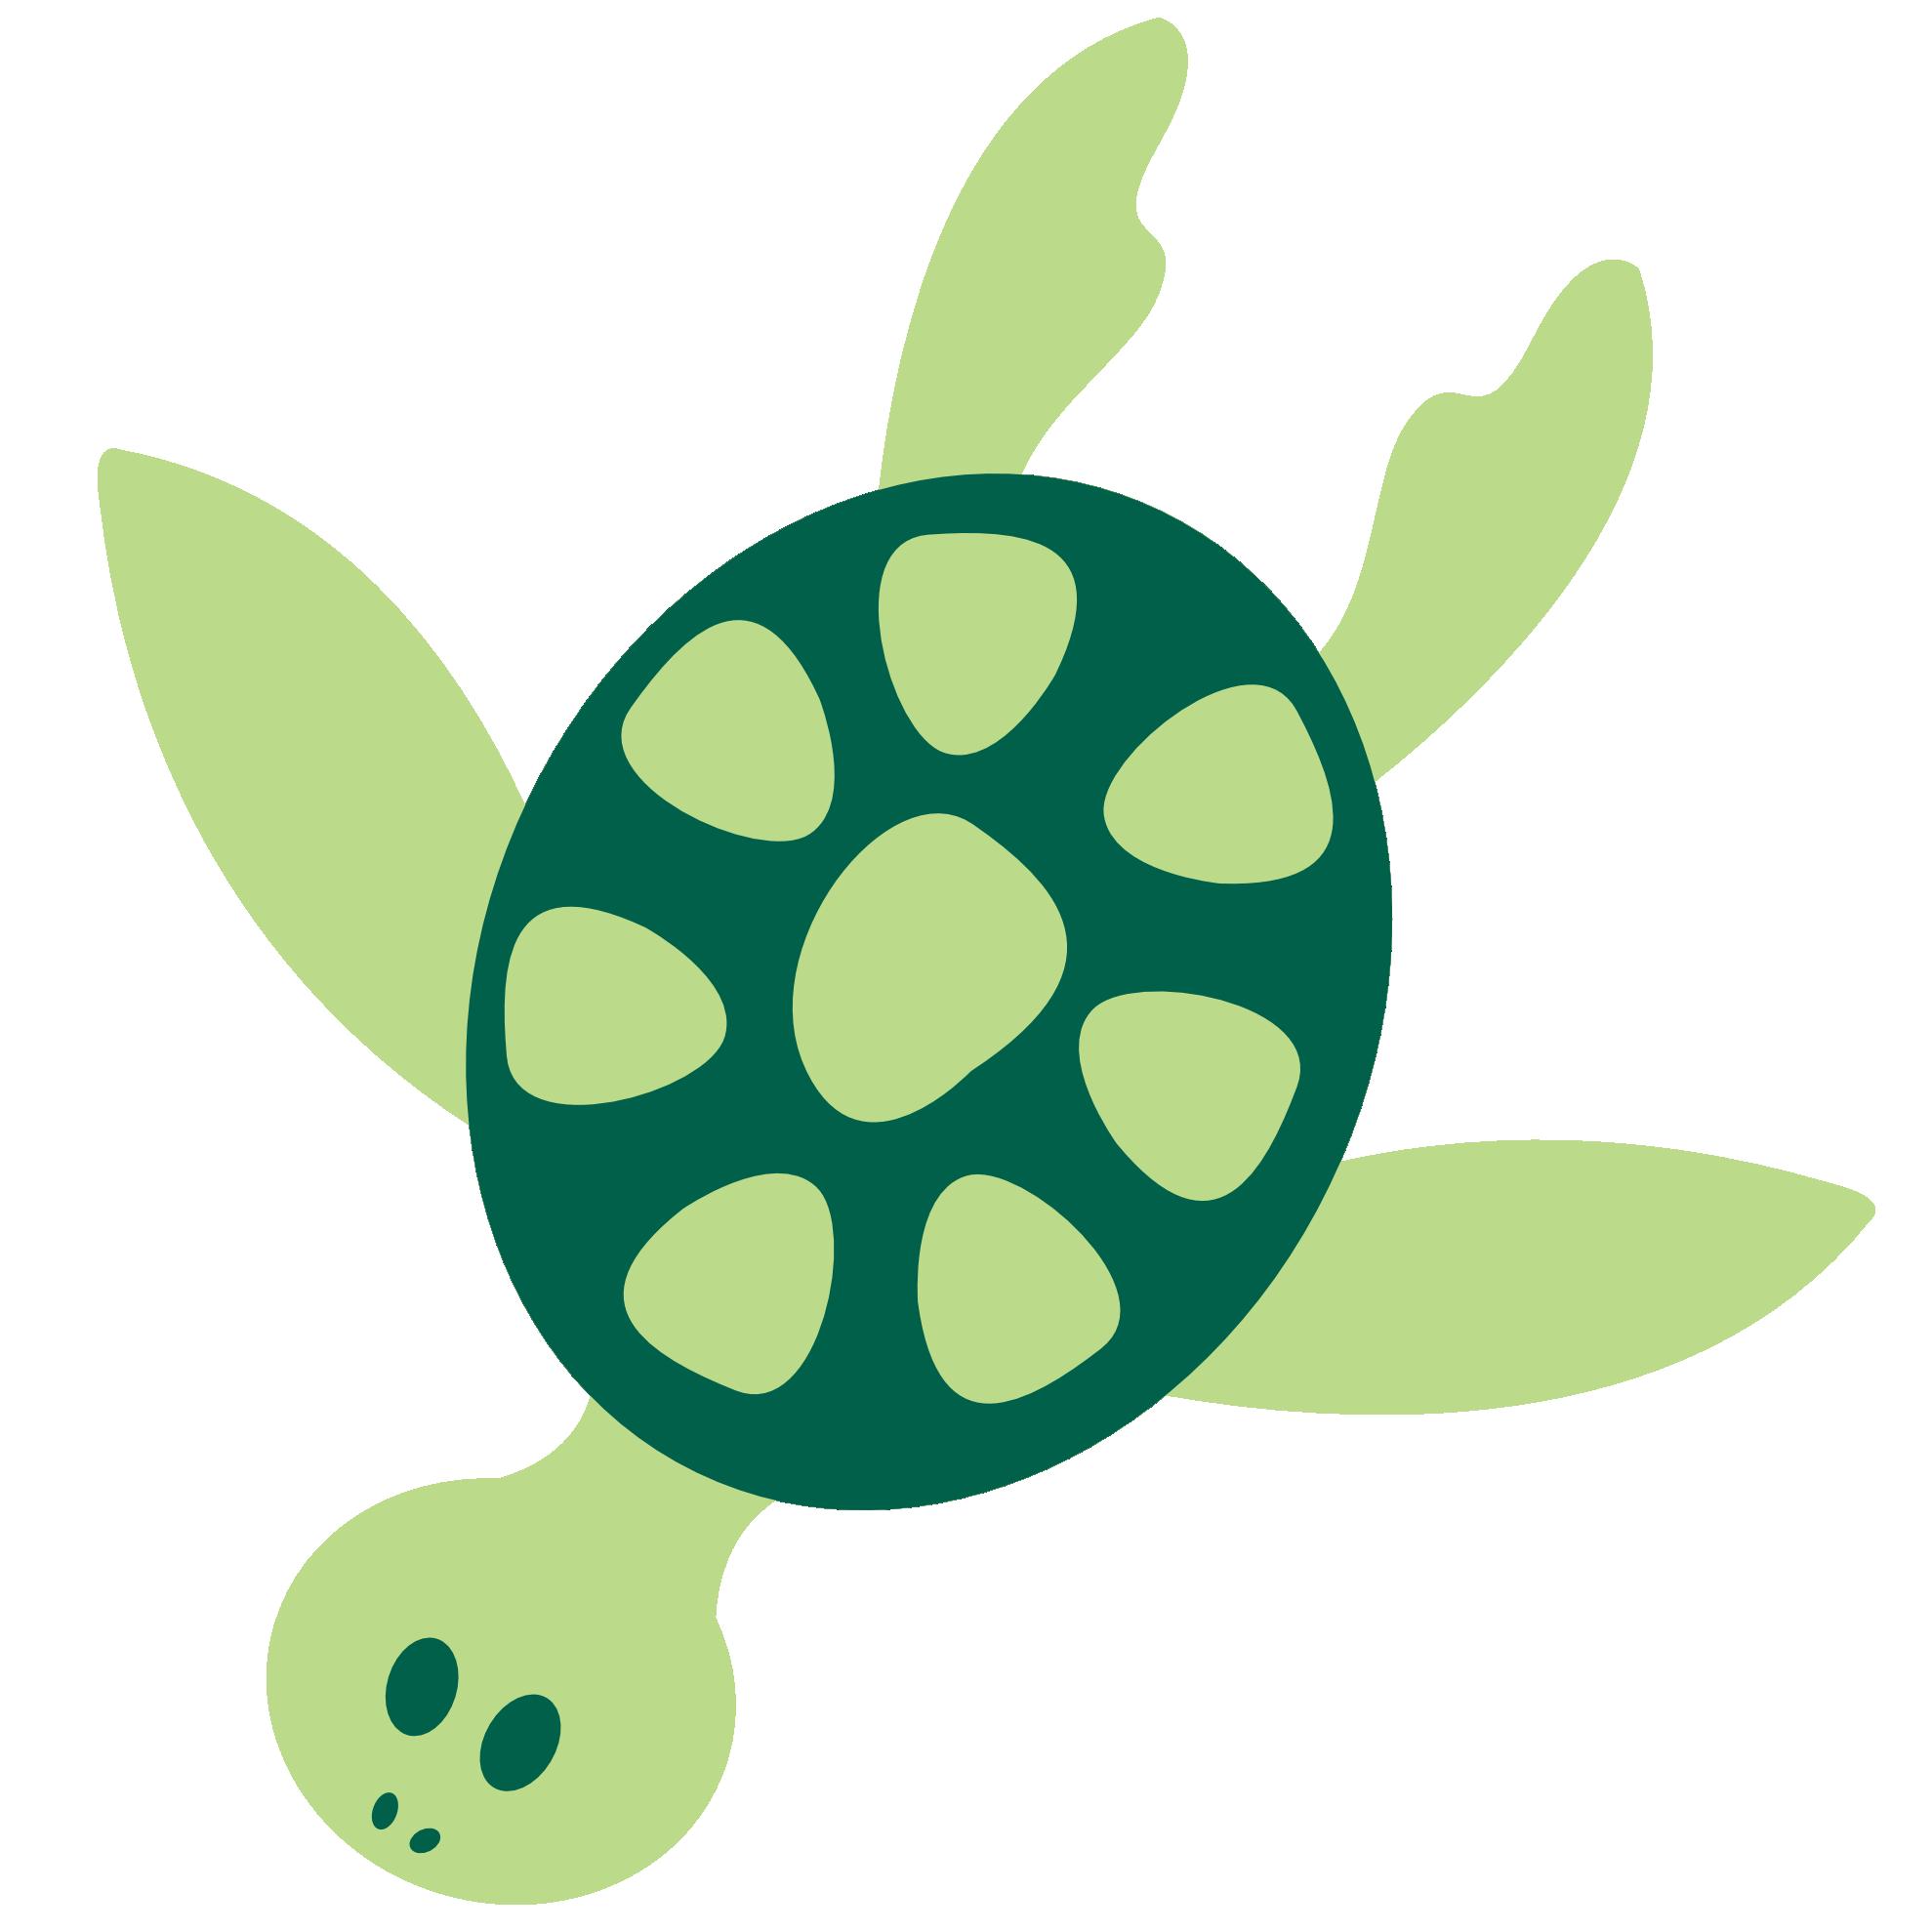 Sea Turtle Clipart | Clipart Panda - Free Clipart Images